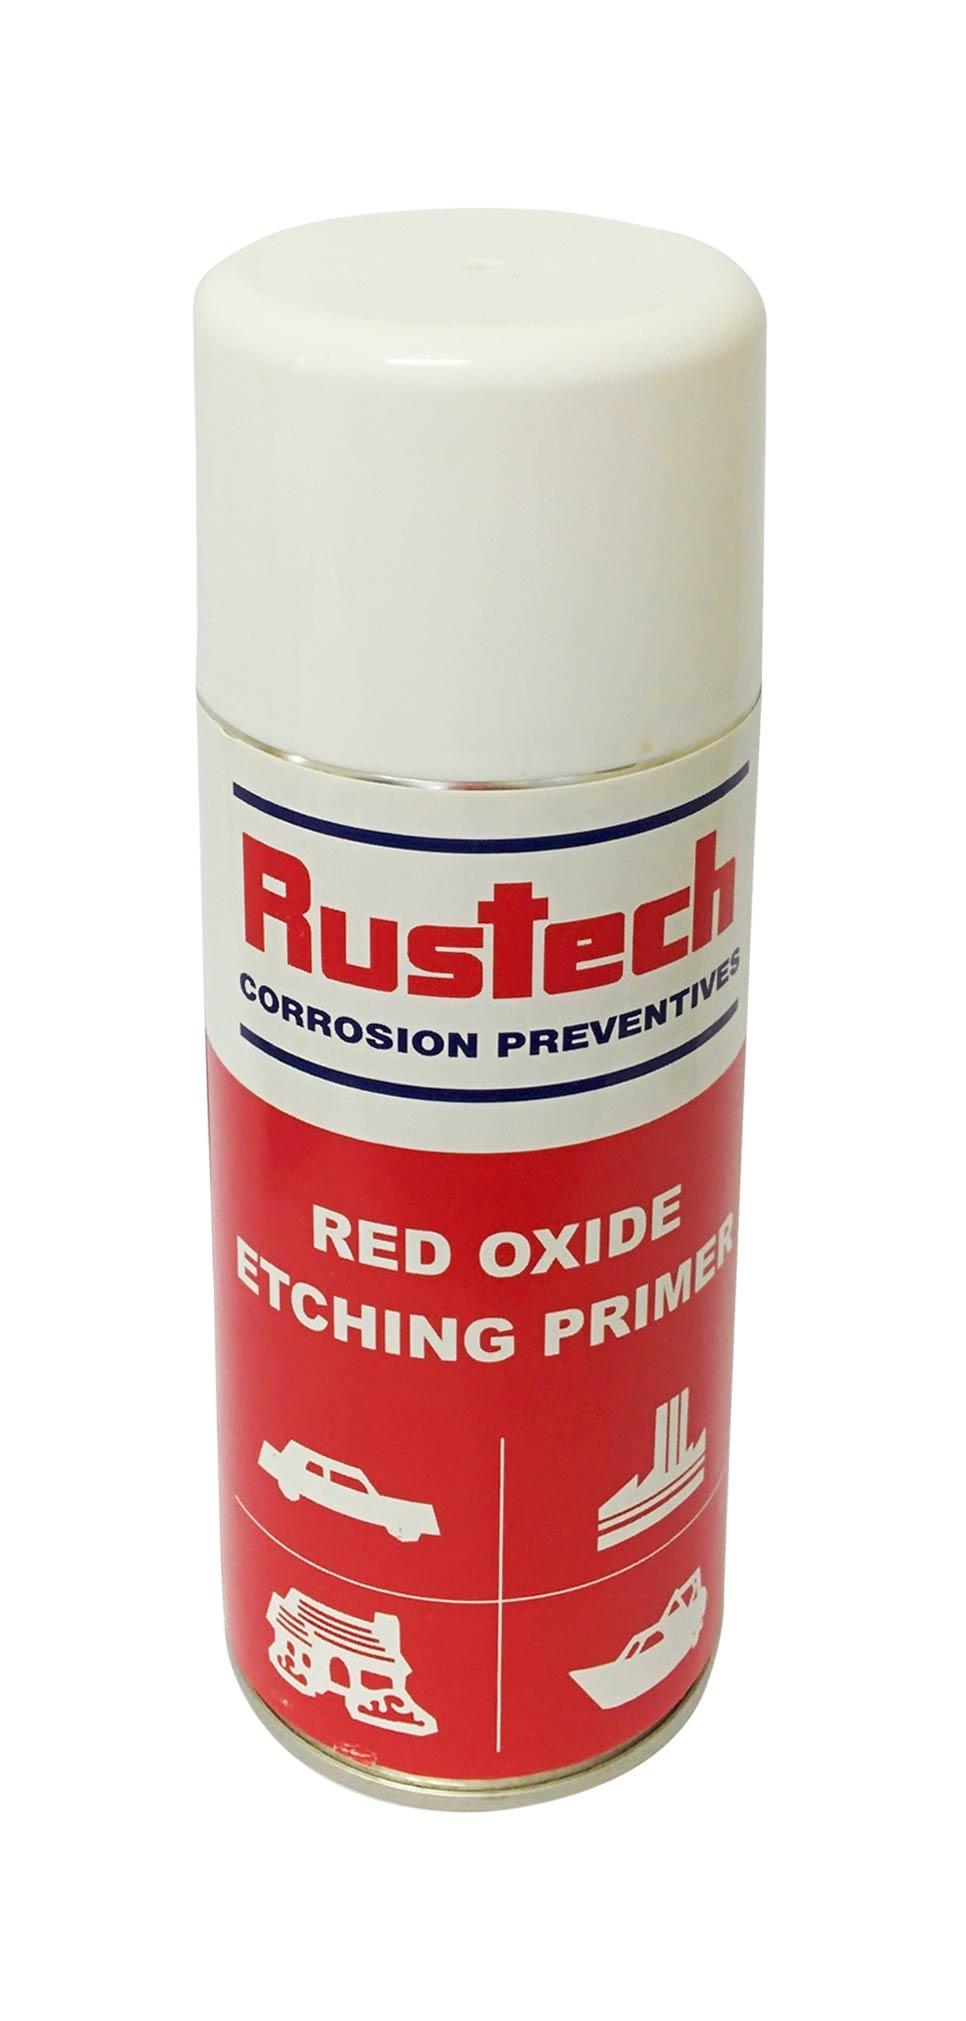 Rustech_RedOxideEtchingPrimer.jpg